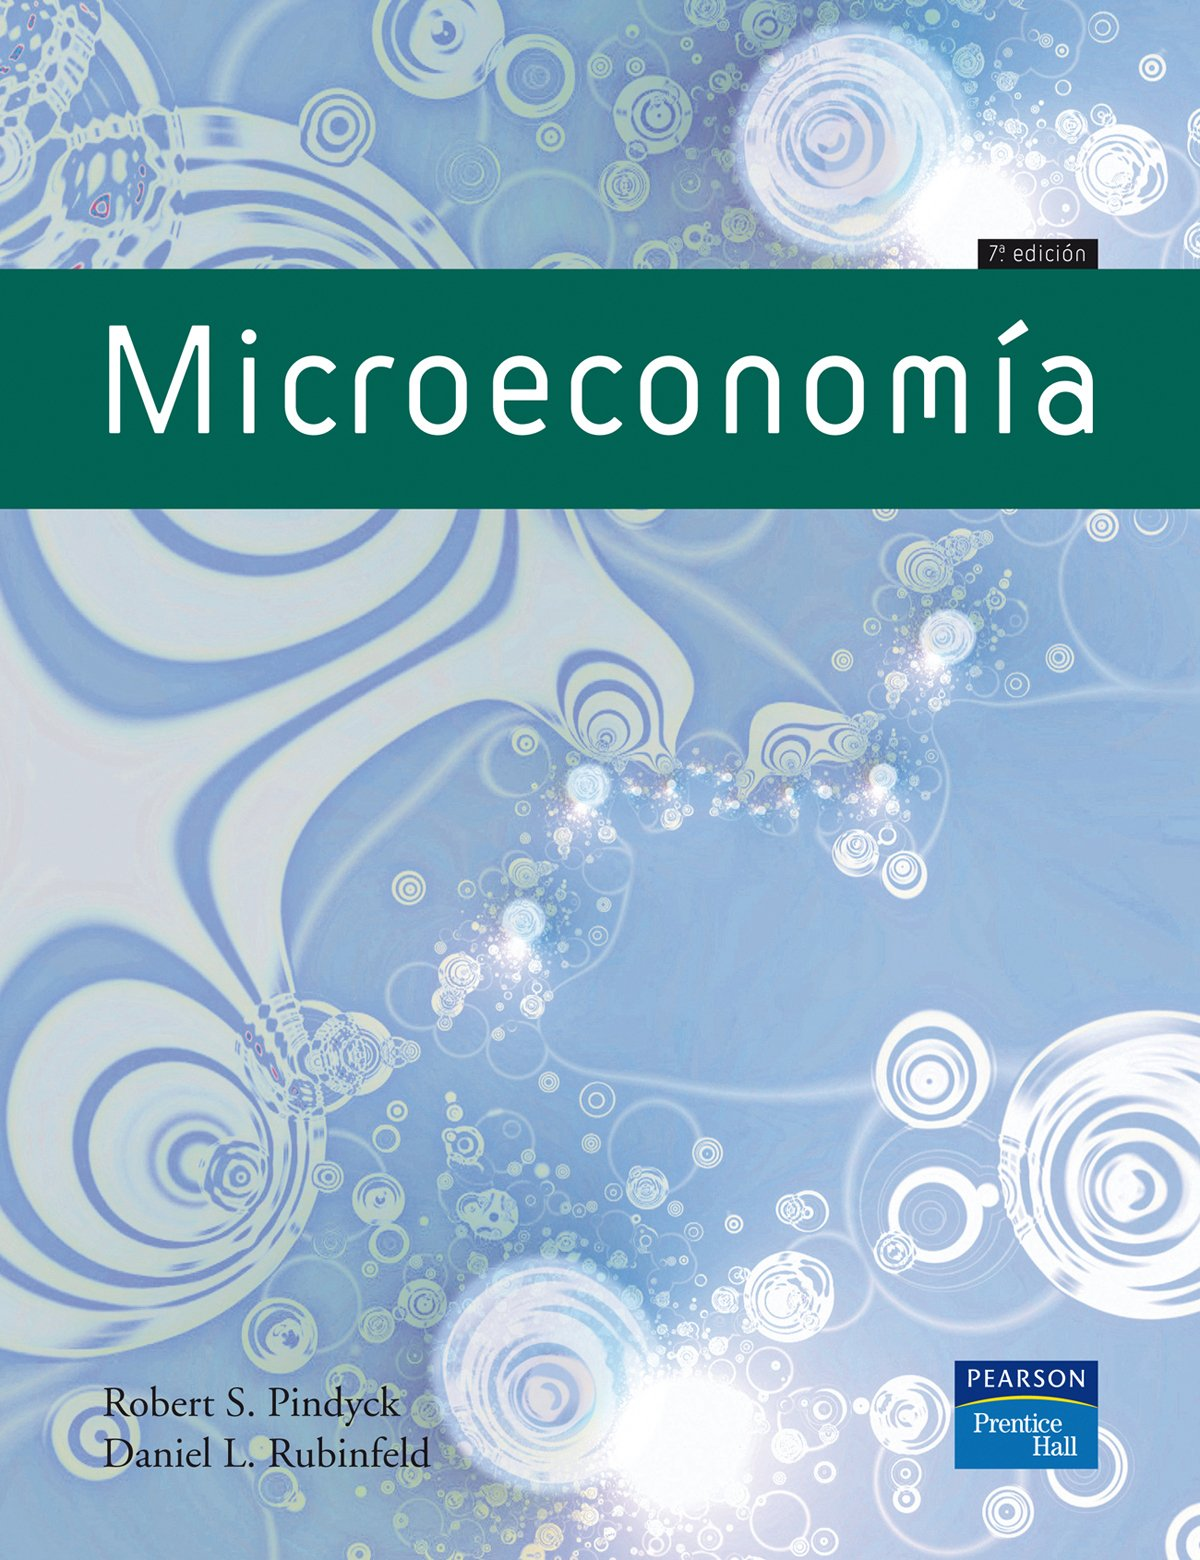 DESCARGAR GRATIS MICROECONOMIA ROBERT PINDYCK PDF @tataya.com.mx 2020